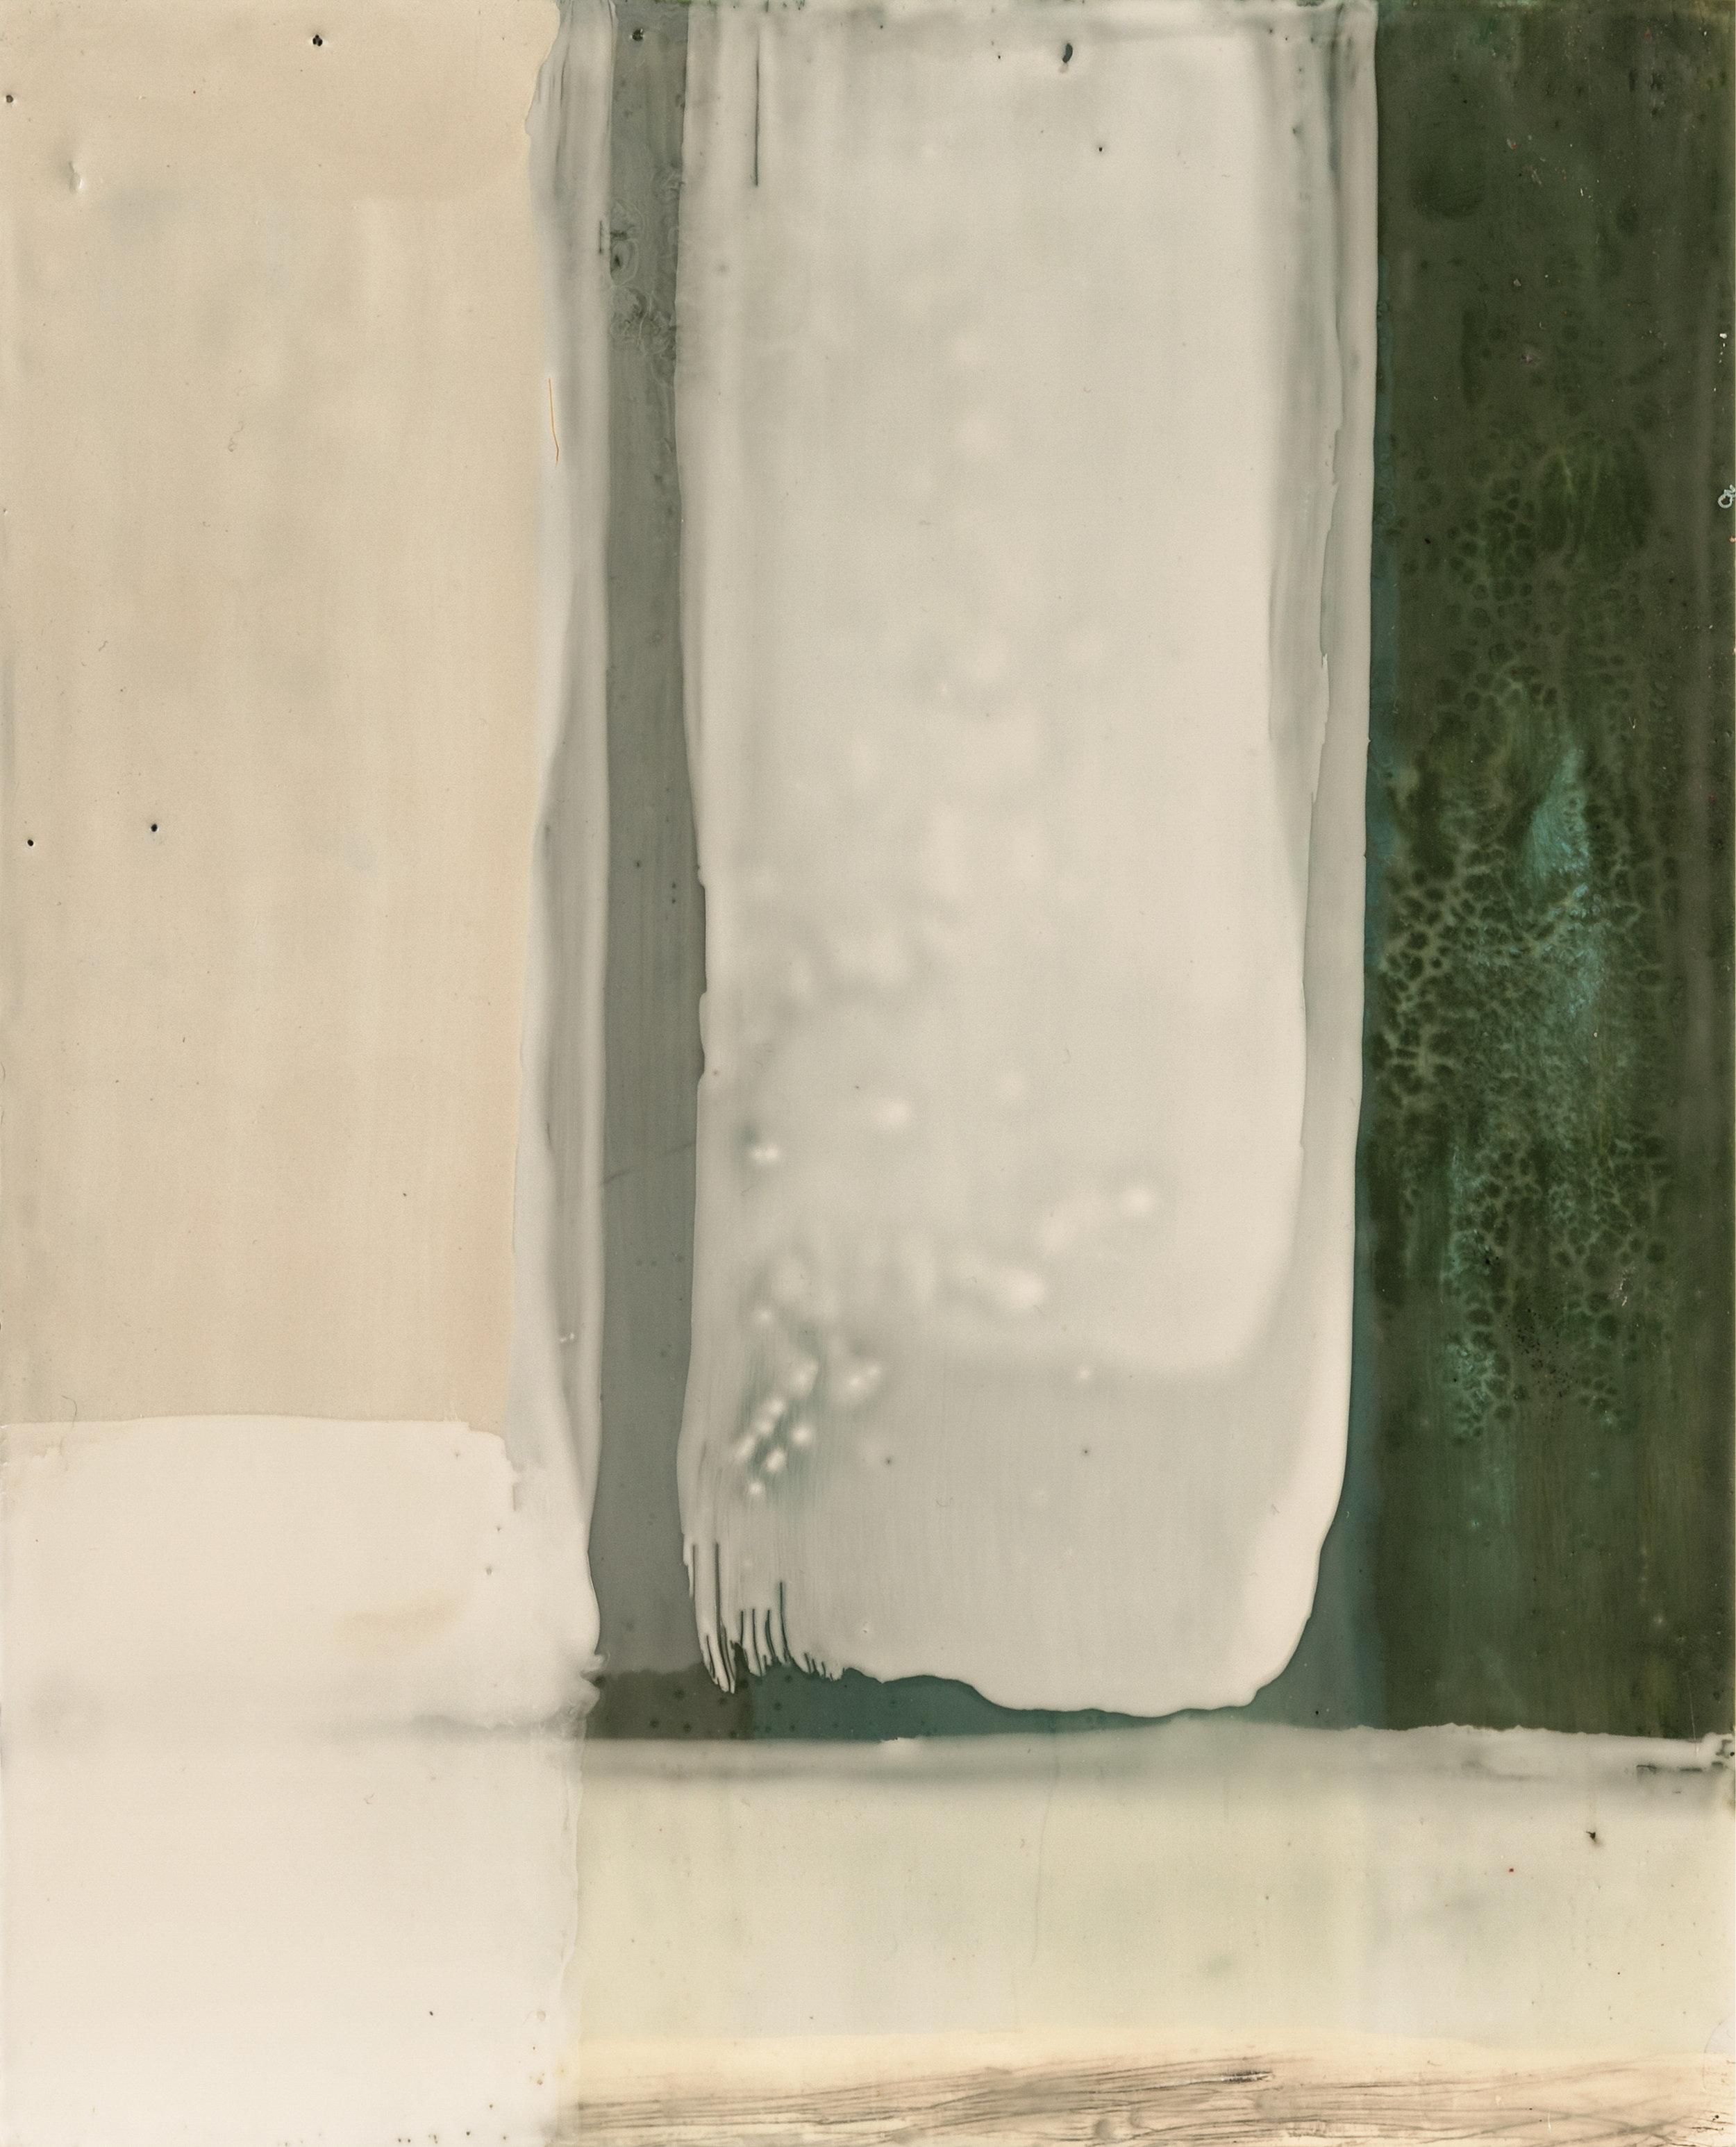 Untitled 1, Encaustic on Birch Panel, 8x10, 2016